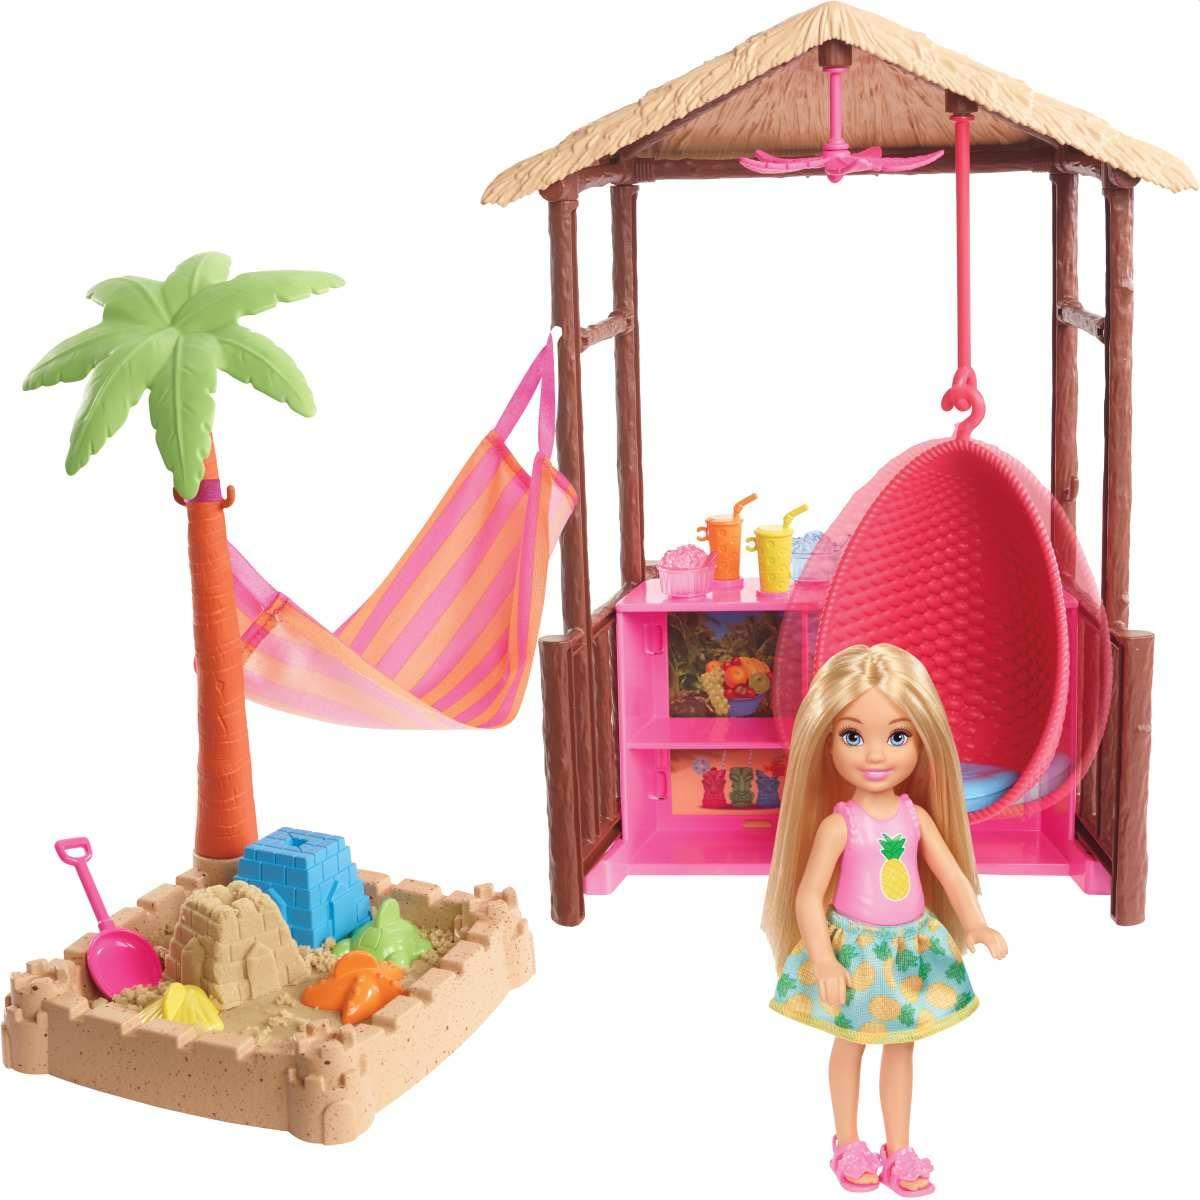 Игровой набор Barbie Chelsea Tiki Hut Playset хижина с качелями Swing, Hammock, Moldable Sand and Accessories